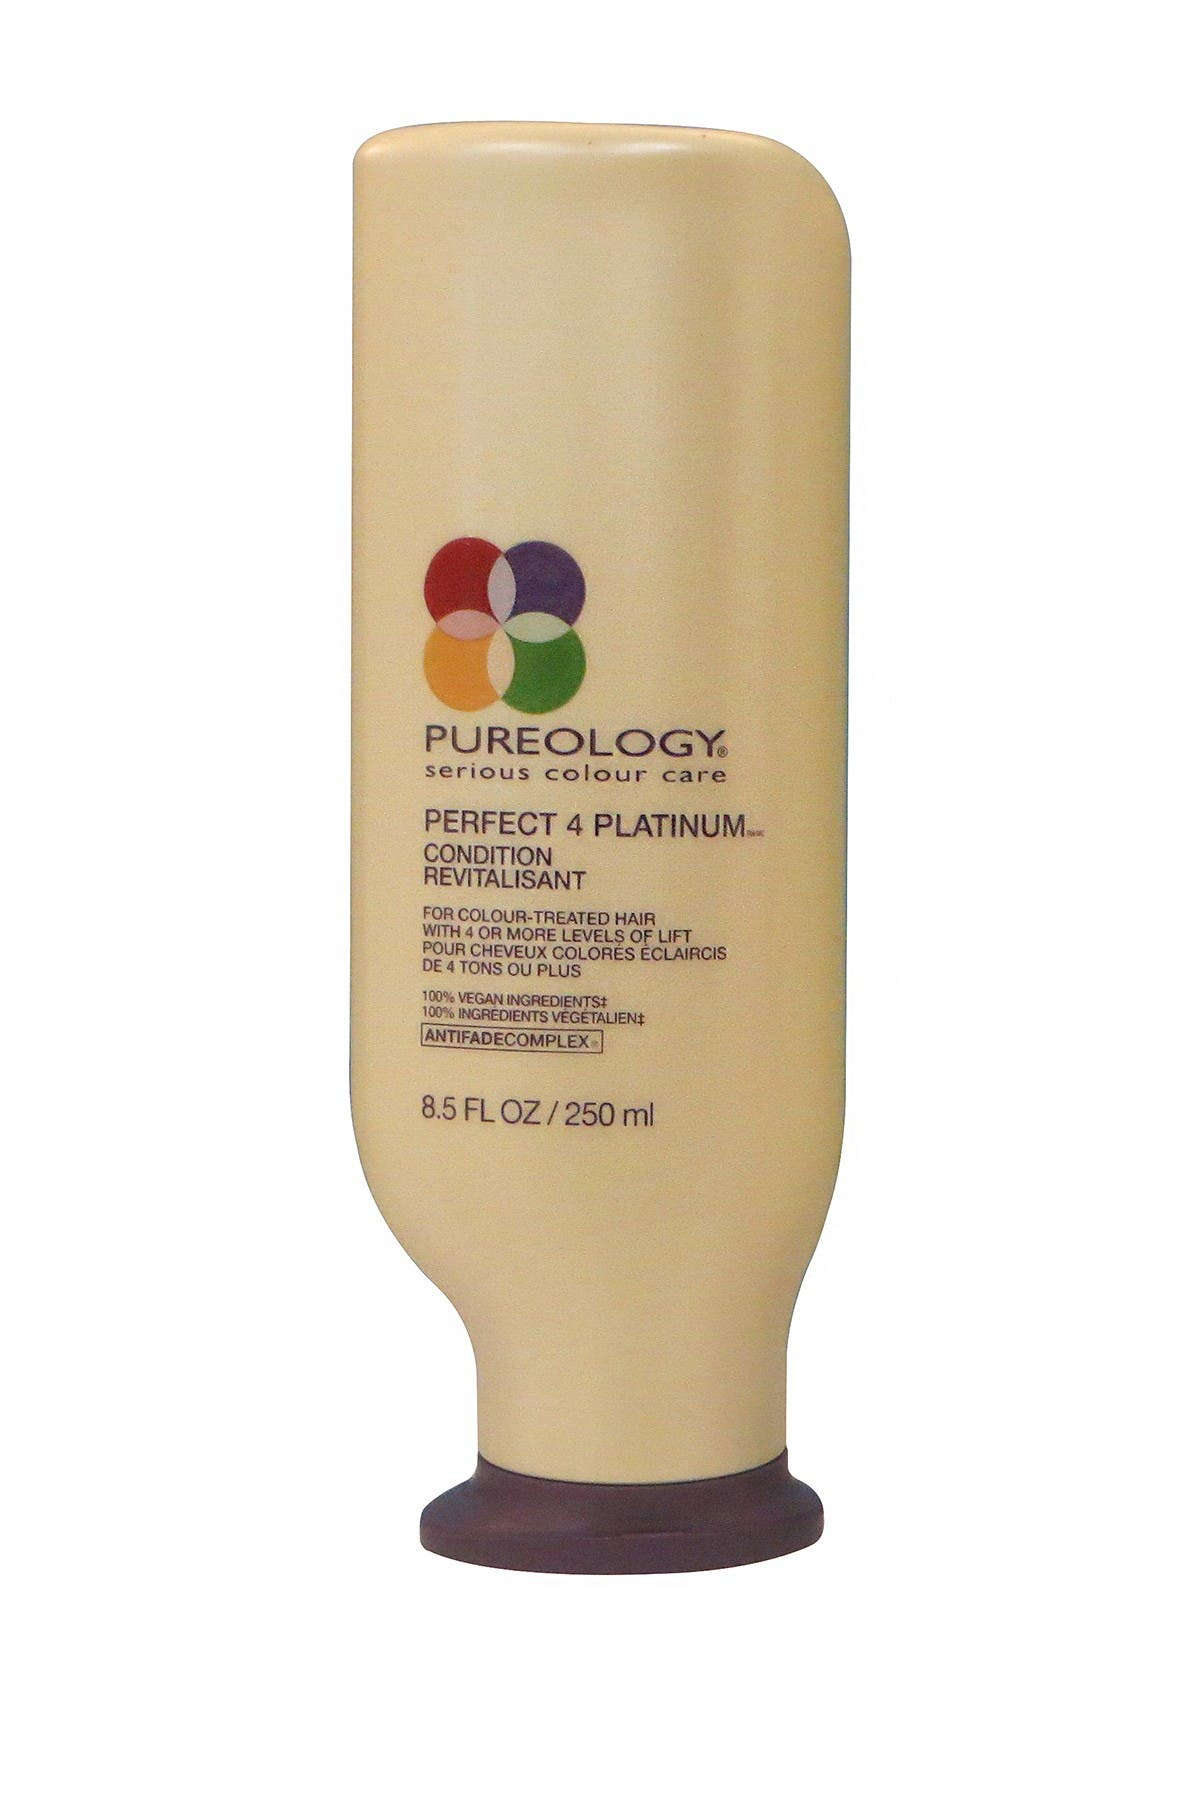 Image of PUREOLOGY Perfect 4 Platinum Conditioner - 8.5 oz.